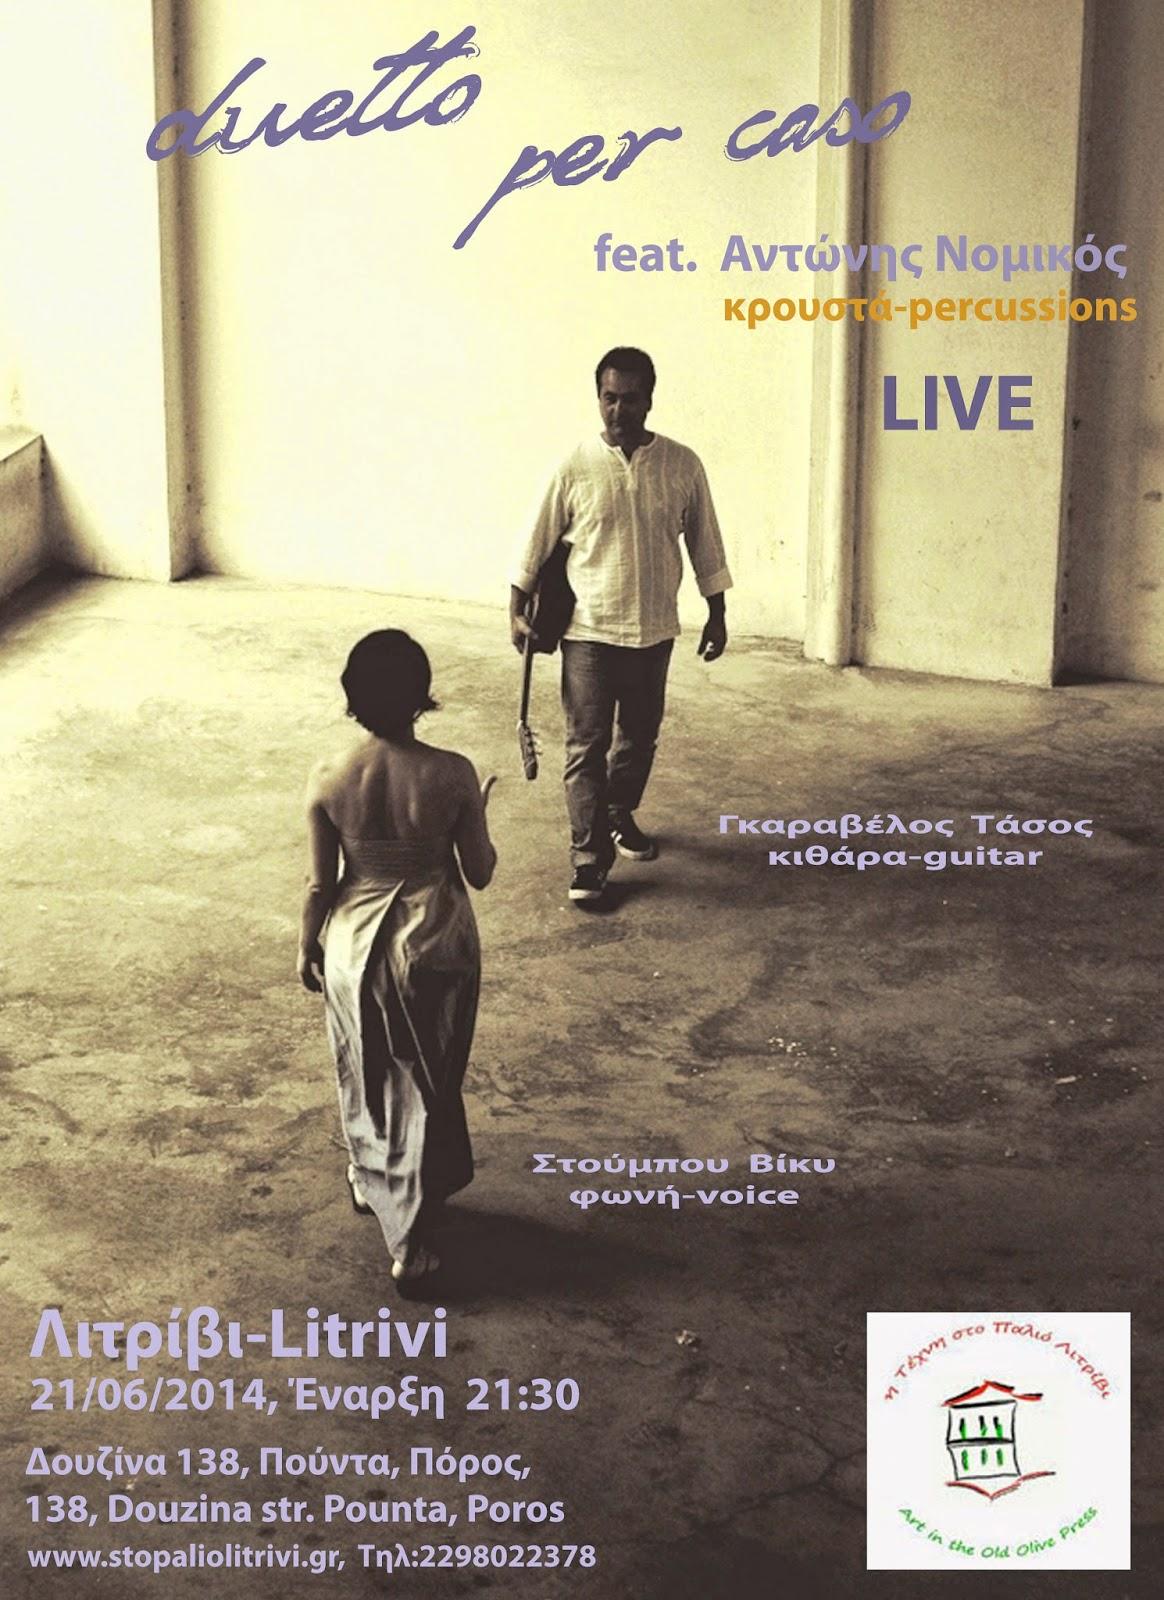 duetto-per-caso-at-litrivi-poros-21-iouniou-2014